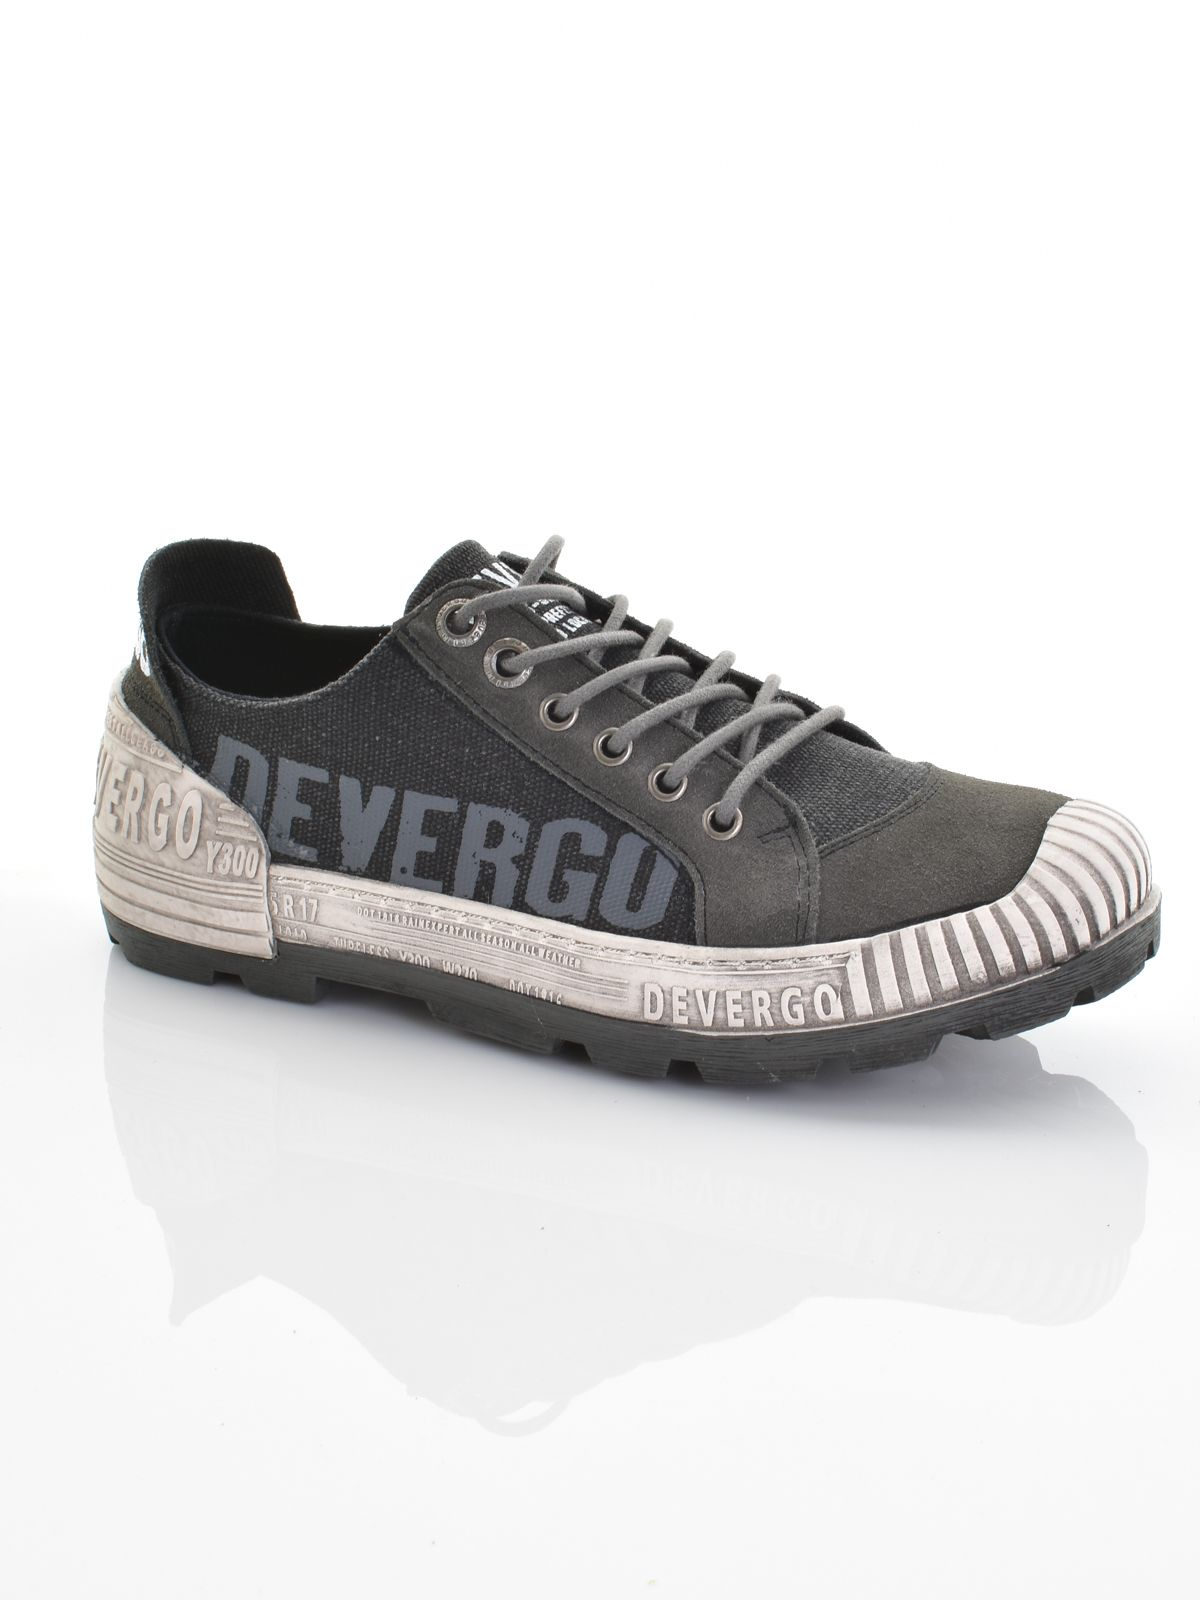 Férfi - Cipő Devergo - fekete  d6e0bdb525